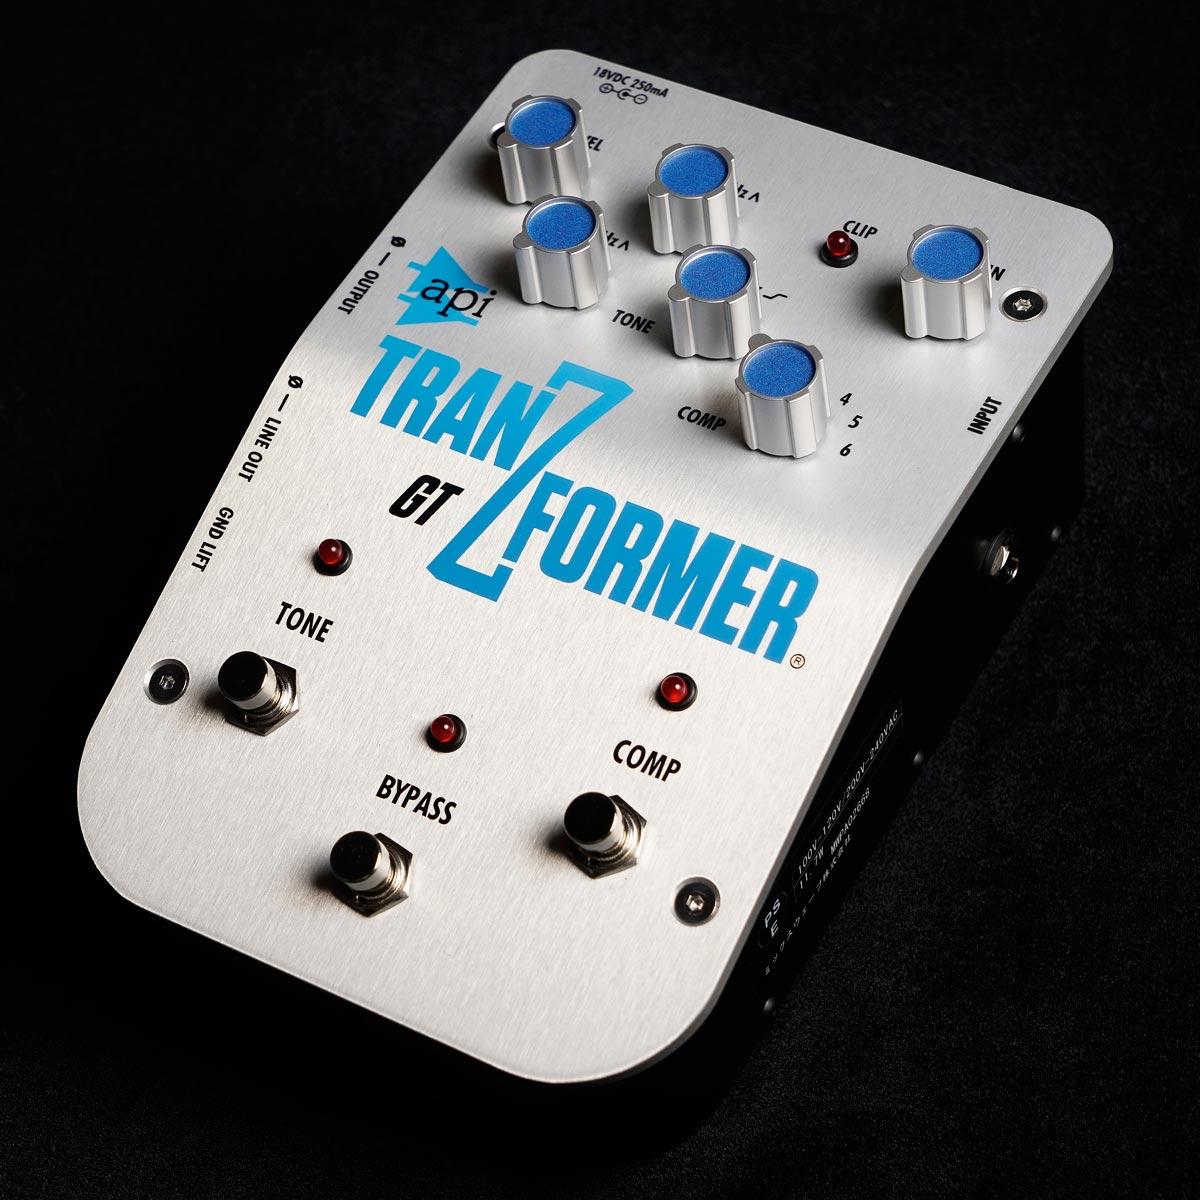 api / TranZformer GT ギター用プリアンプ 【新宿店】